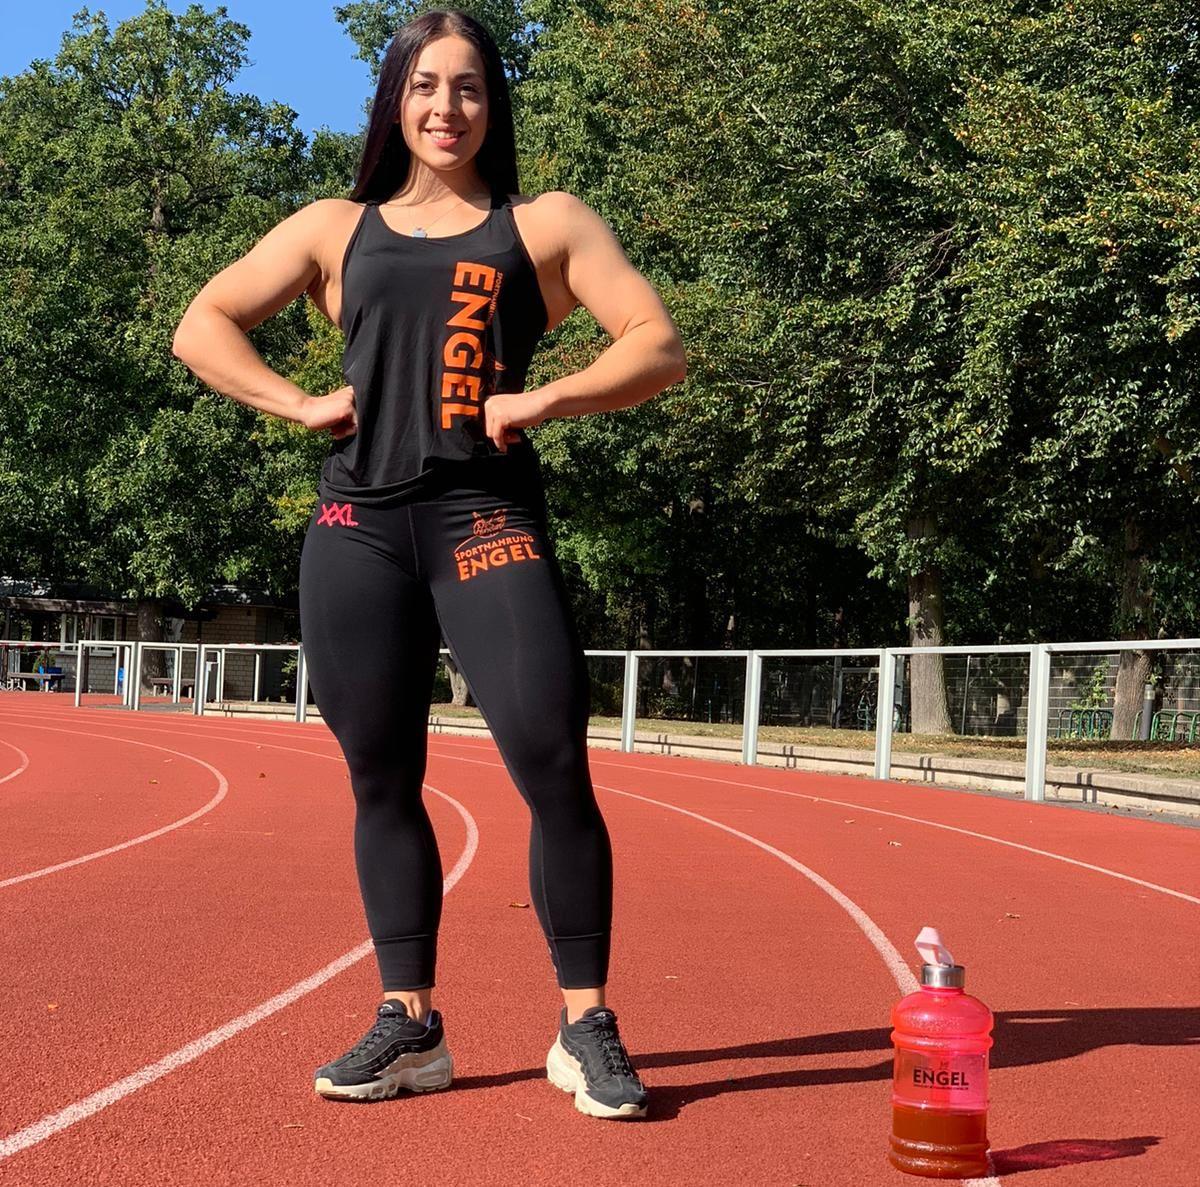 Figur Athletin Lisa Hillebrand posing auf Laufbahn